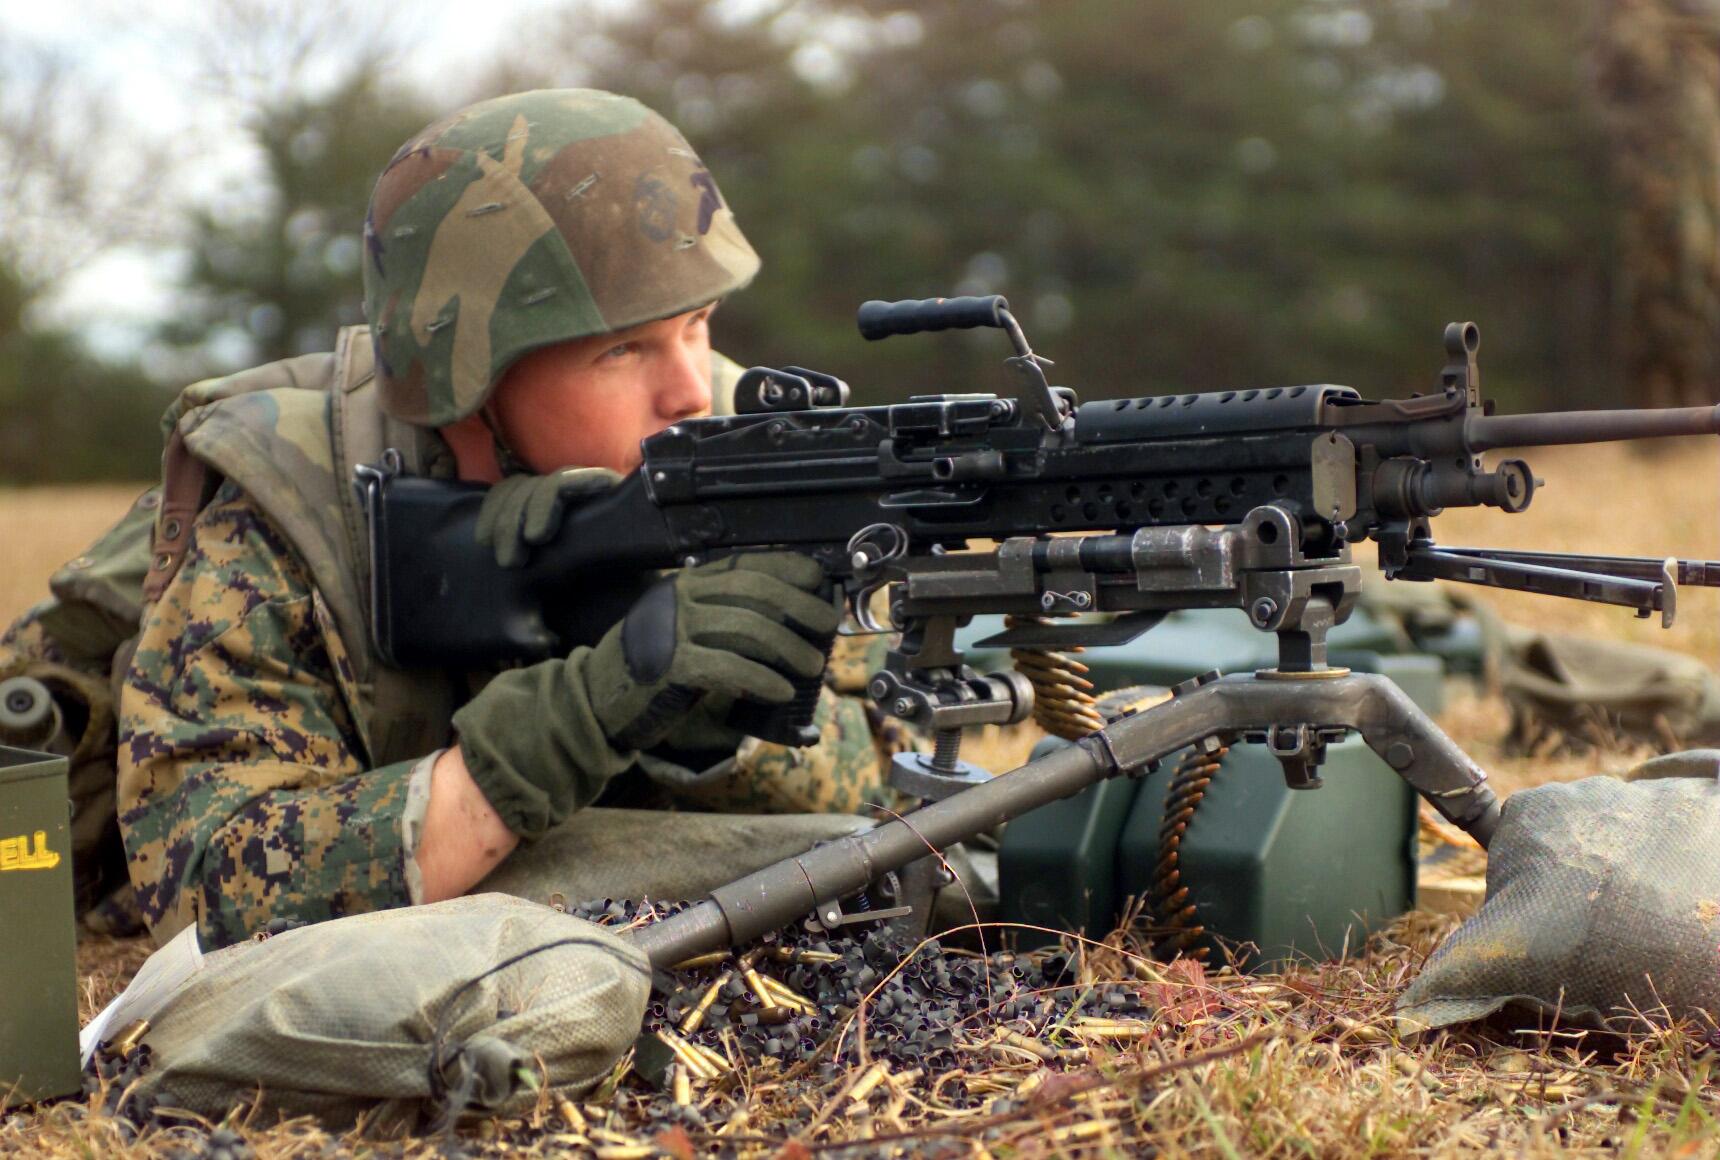 File:M249 FN MINIMI DM-SD-05-05342.jpg - Wikimedia Commons